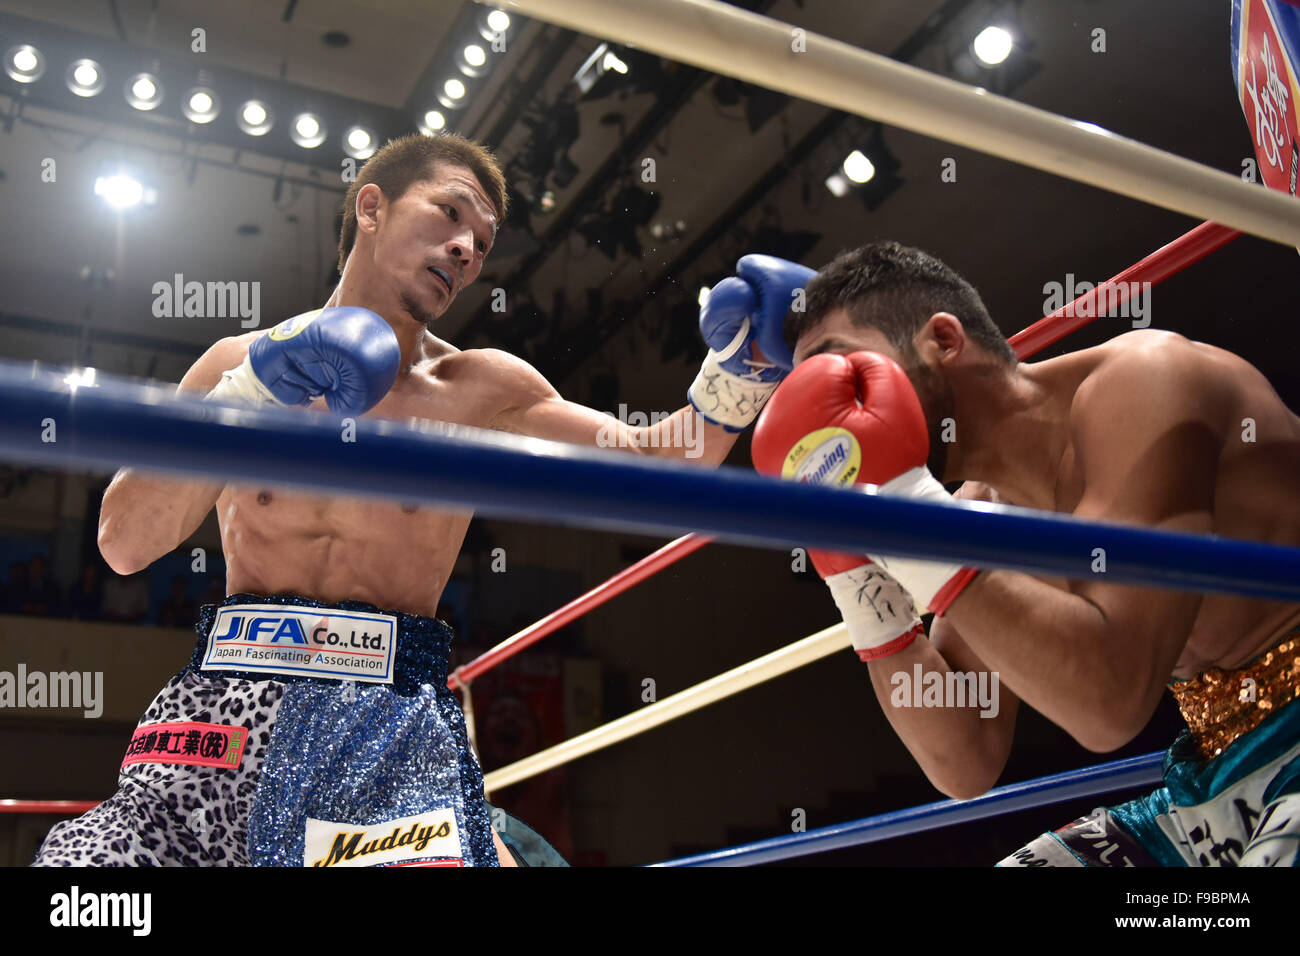 Tokyo, Giappone. Xiv Dic, 2015. (L-R) Kenichi Ogawa, Rikki Naito Boxe : Kenichi Ogawa del Giappone in azione contro Immagini Stock